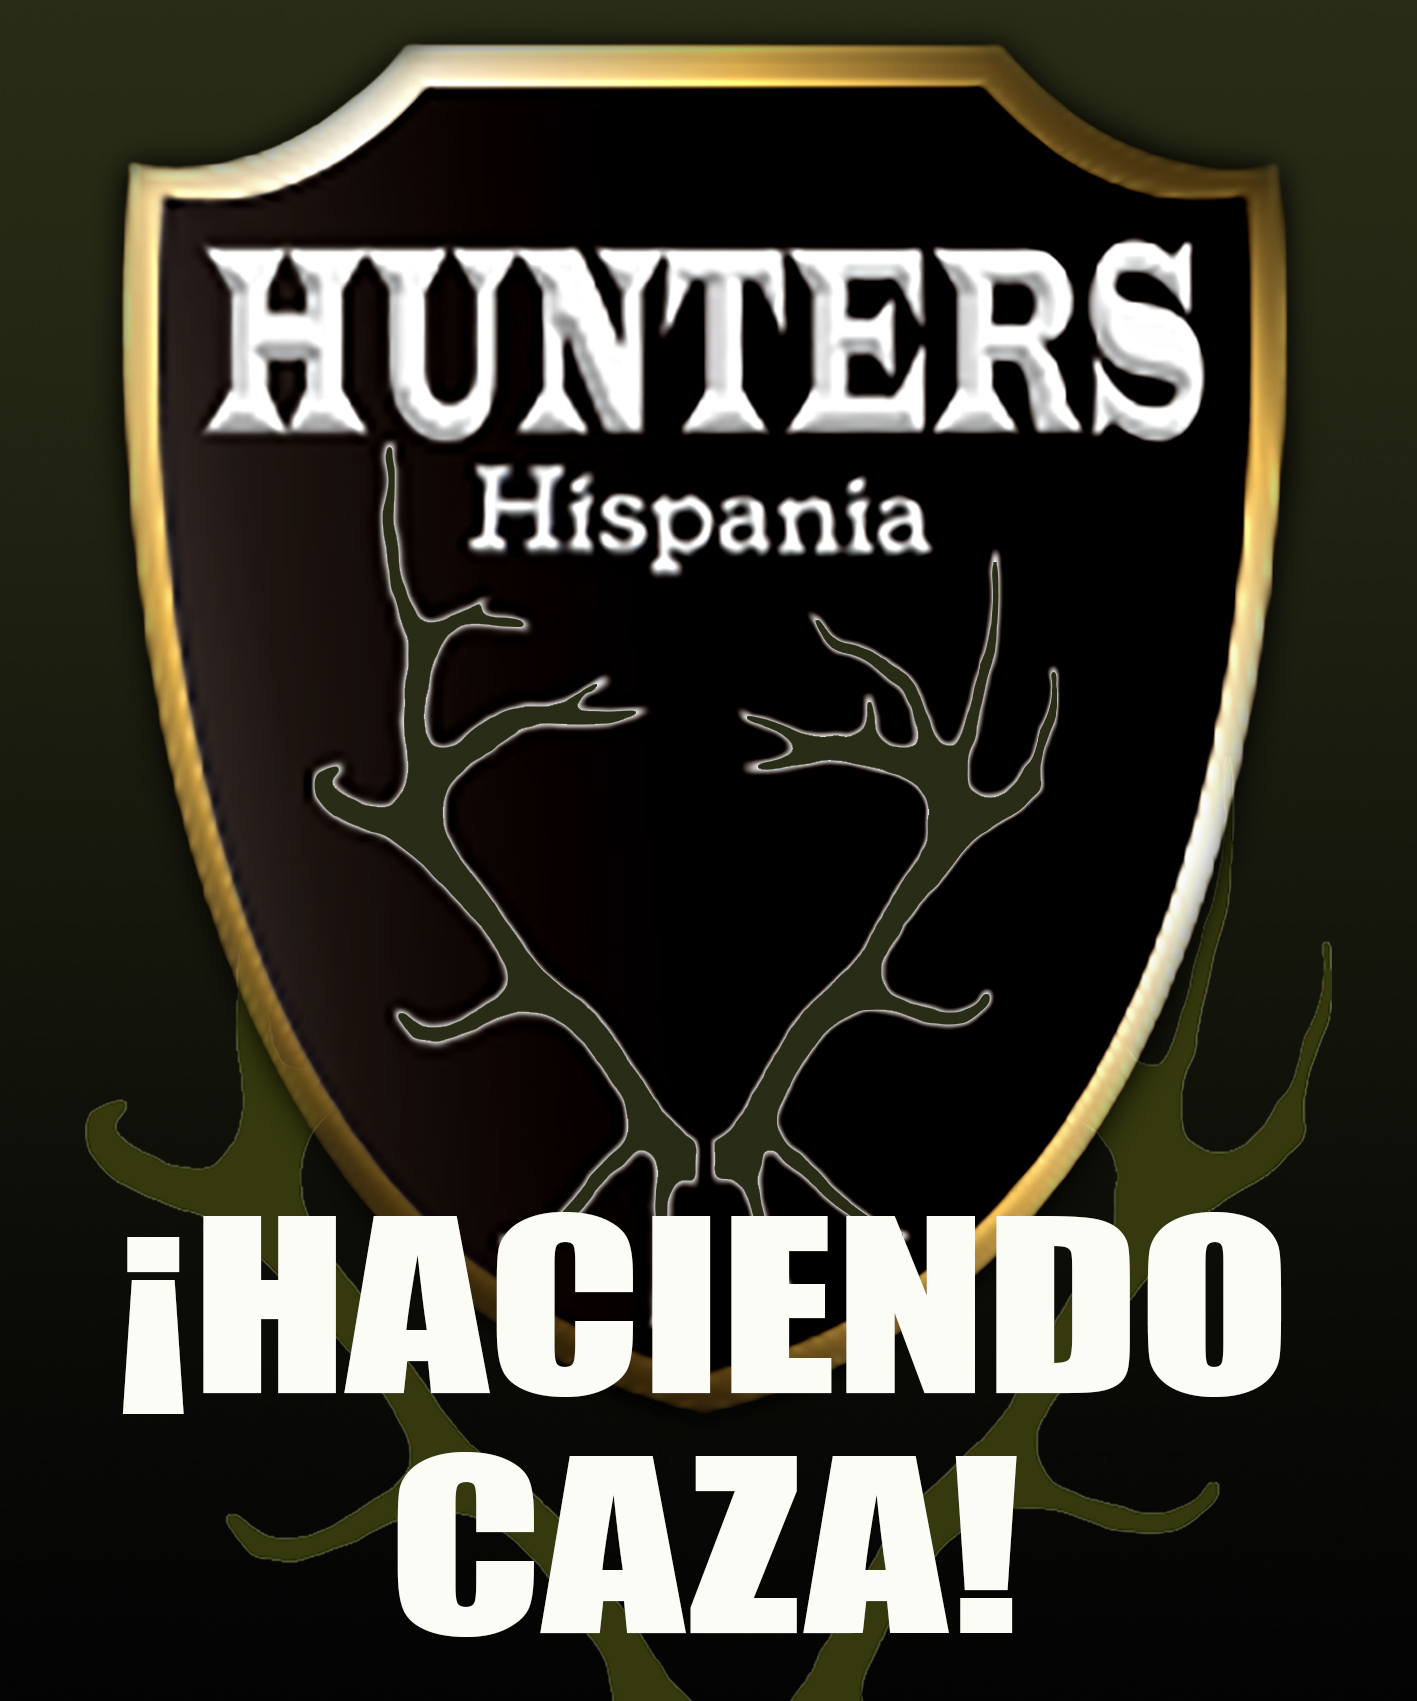 Hunters hispania pop up